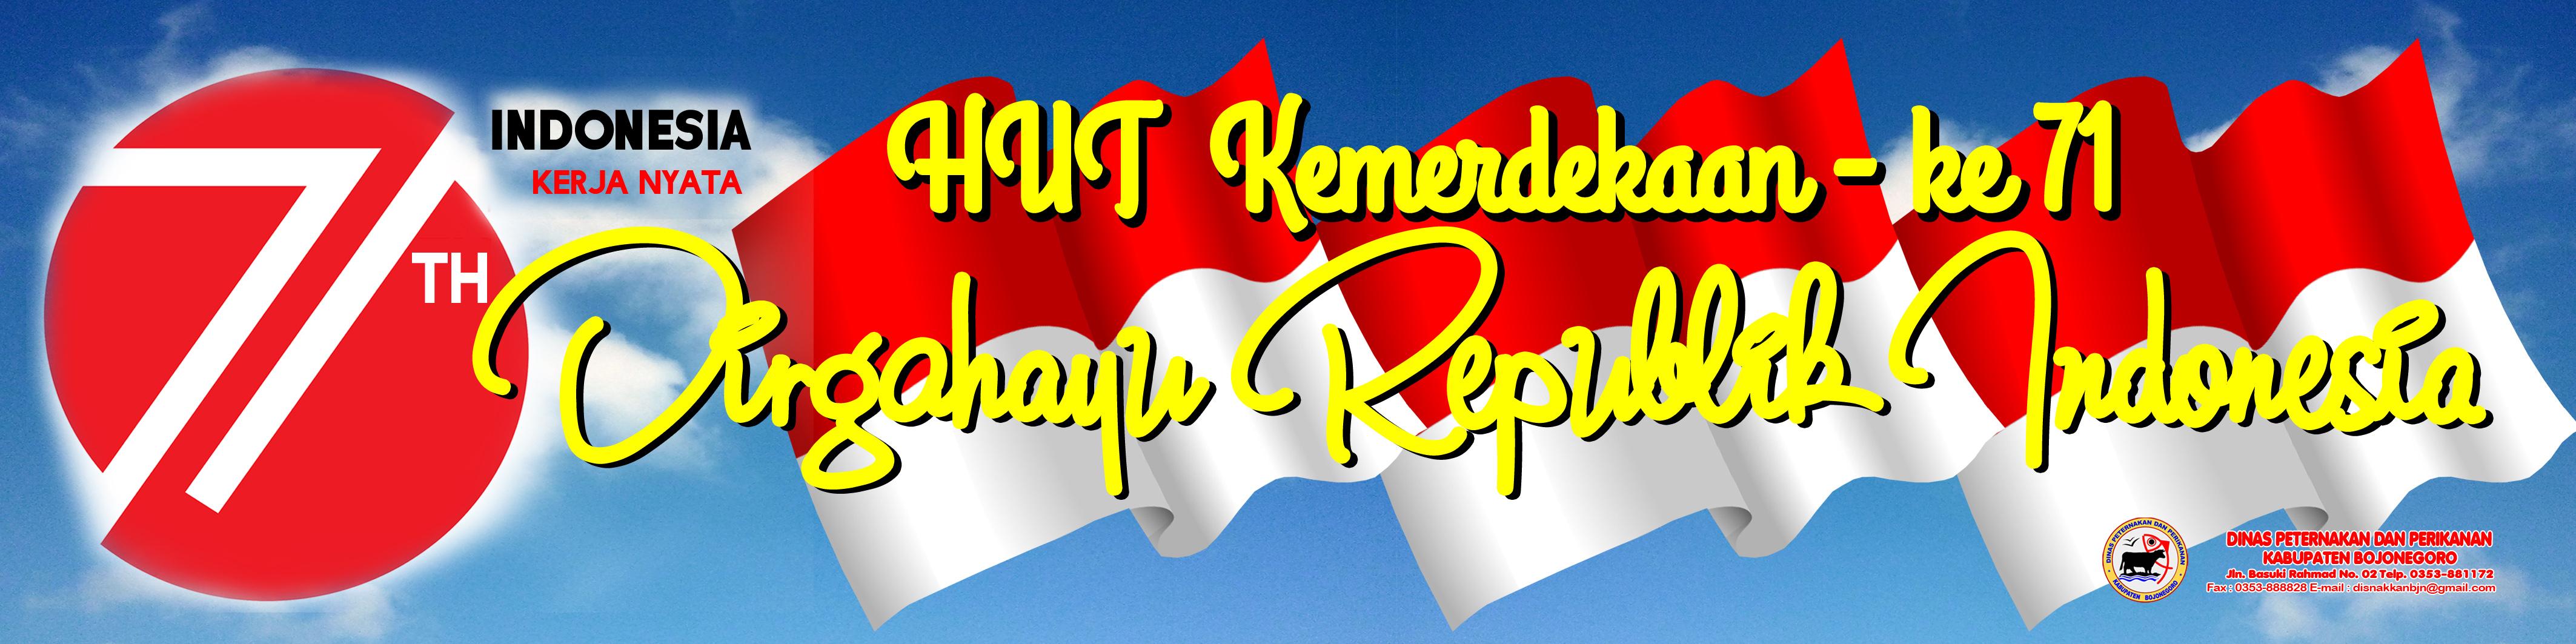 Indonesia <BR>Kerja Nyata